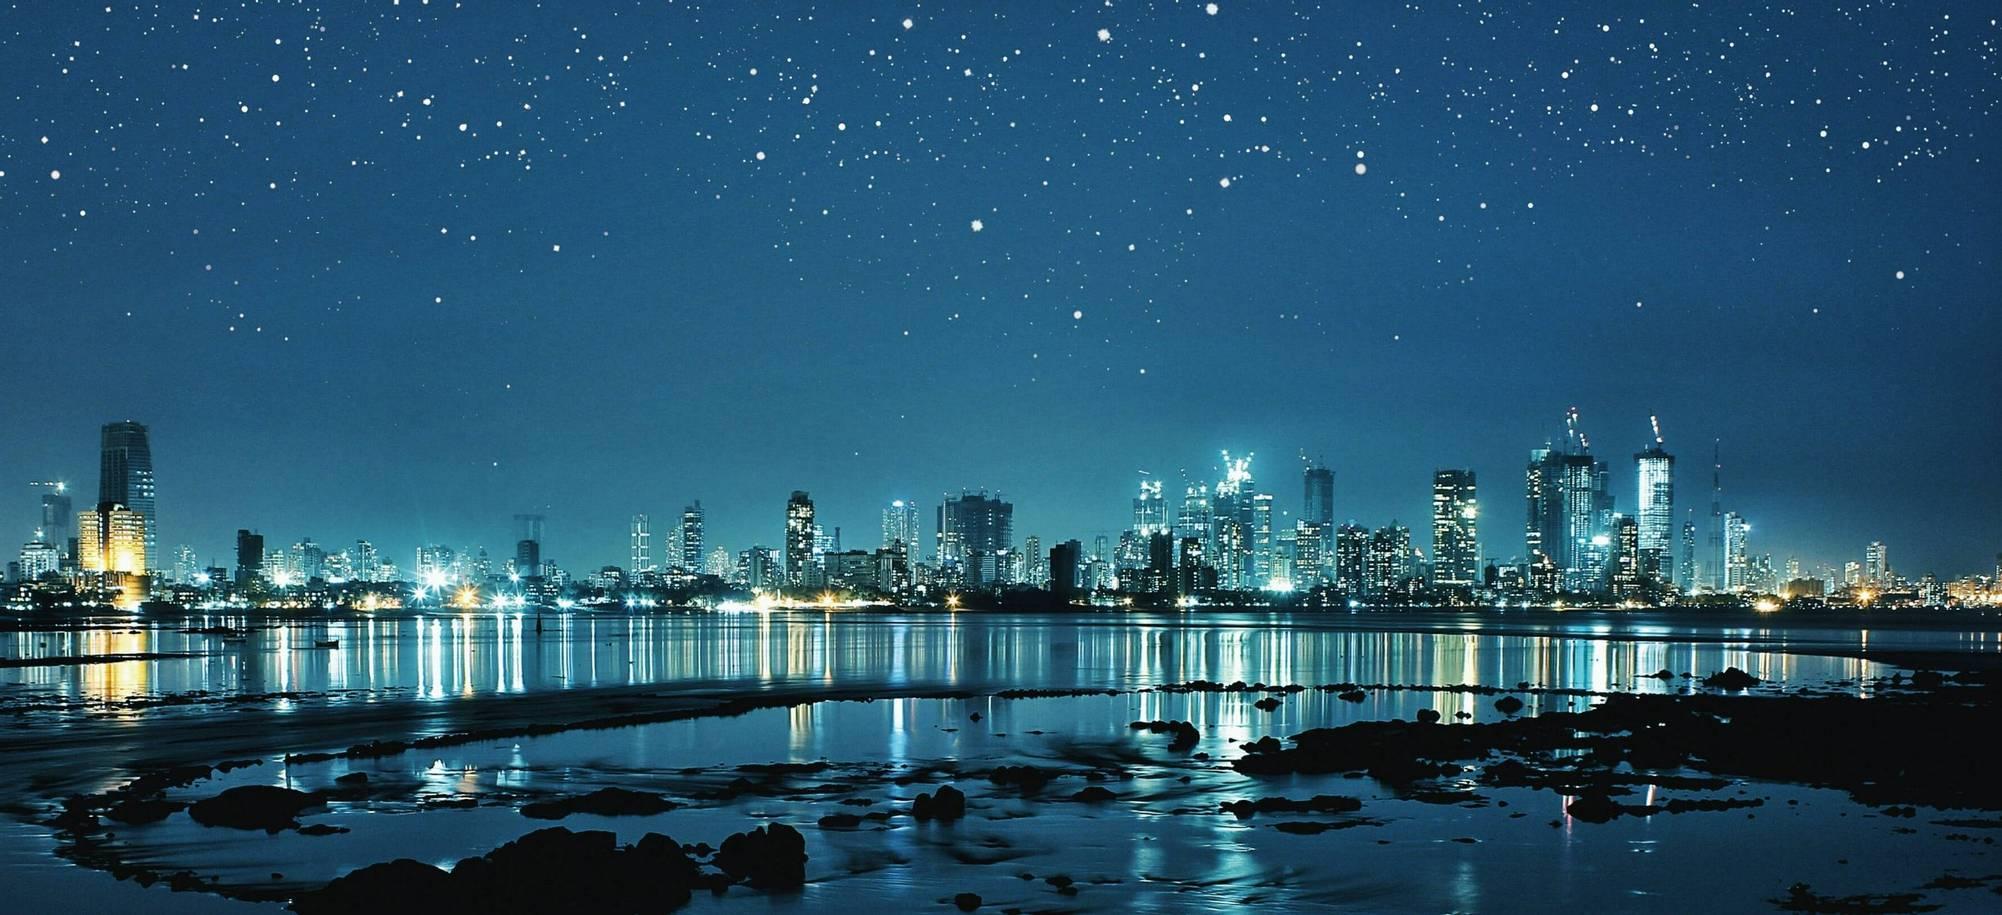 16 day_mumbai city at night _Web.jpg